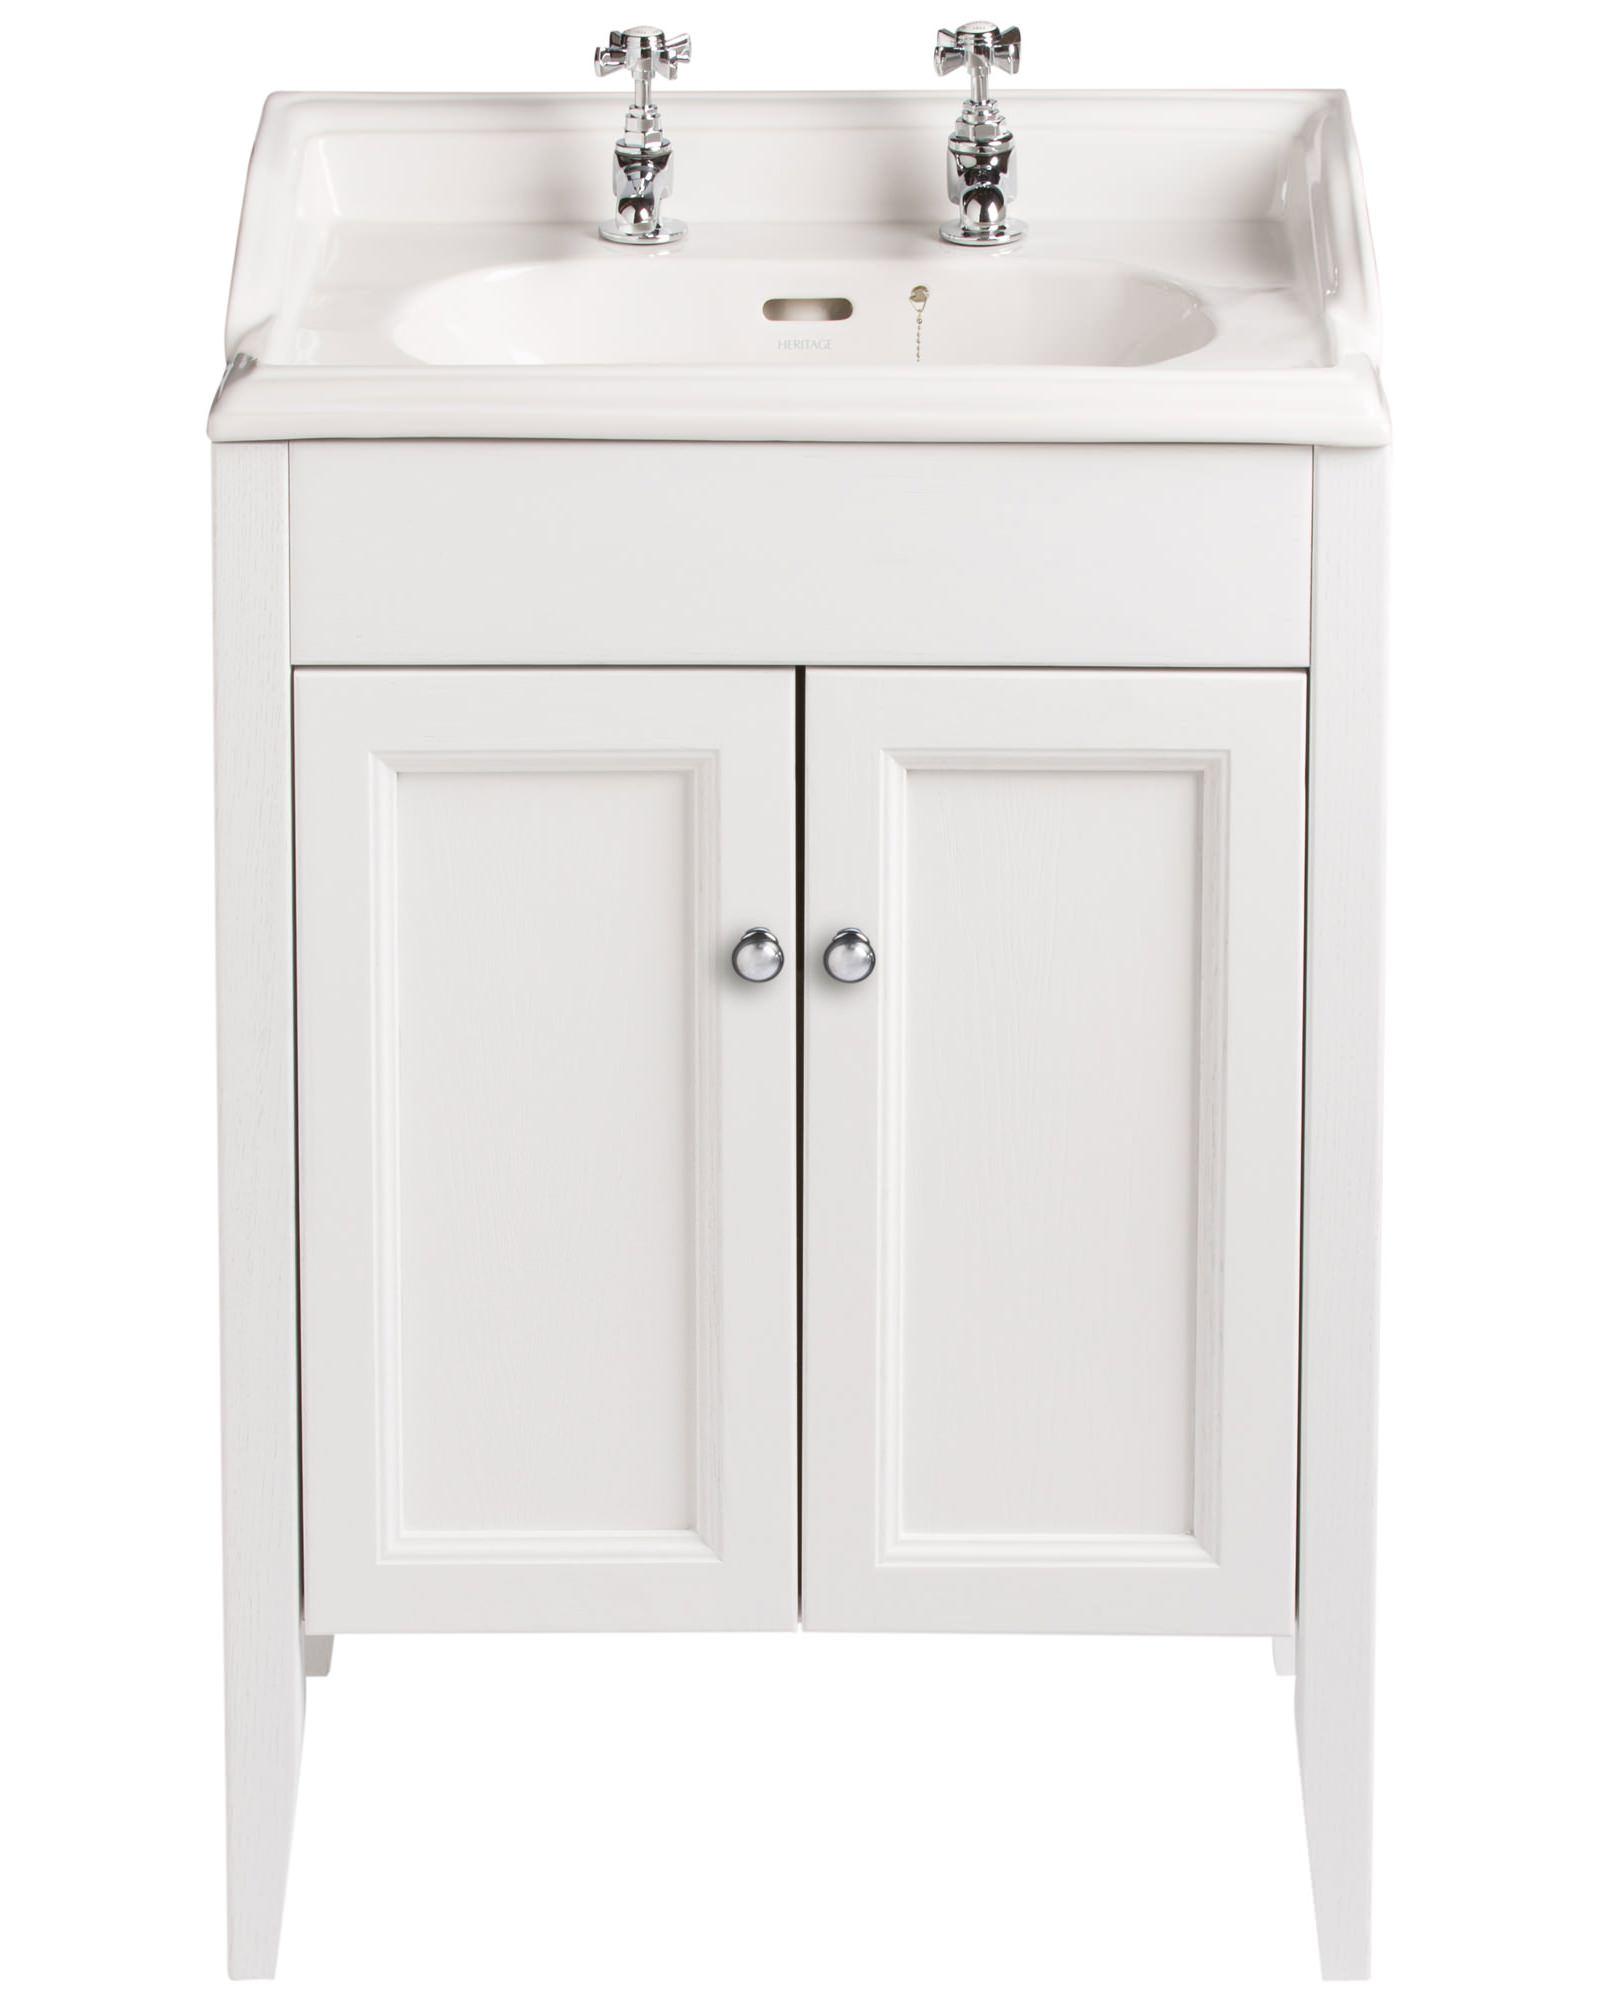 Heritage Bathroom Vanity: Heritage Caversham White Ash Vanity Unit For Dorchester